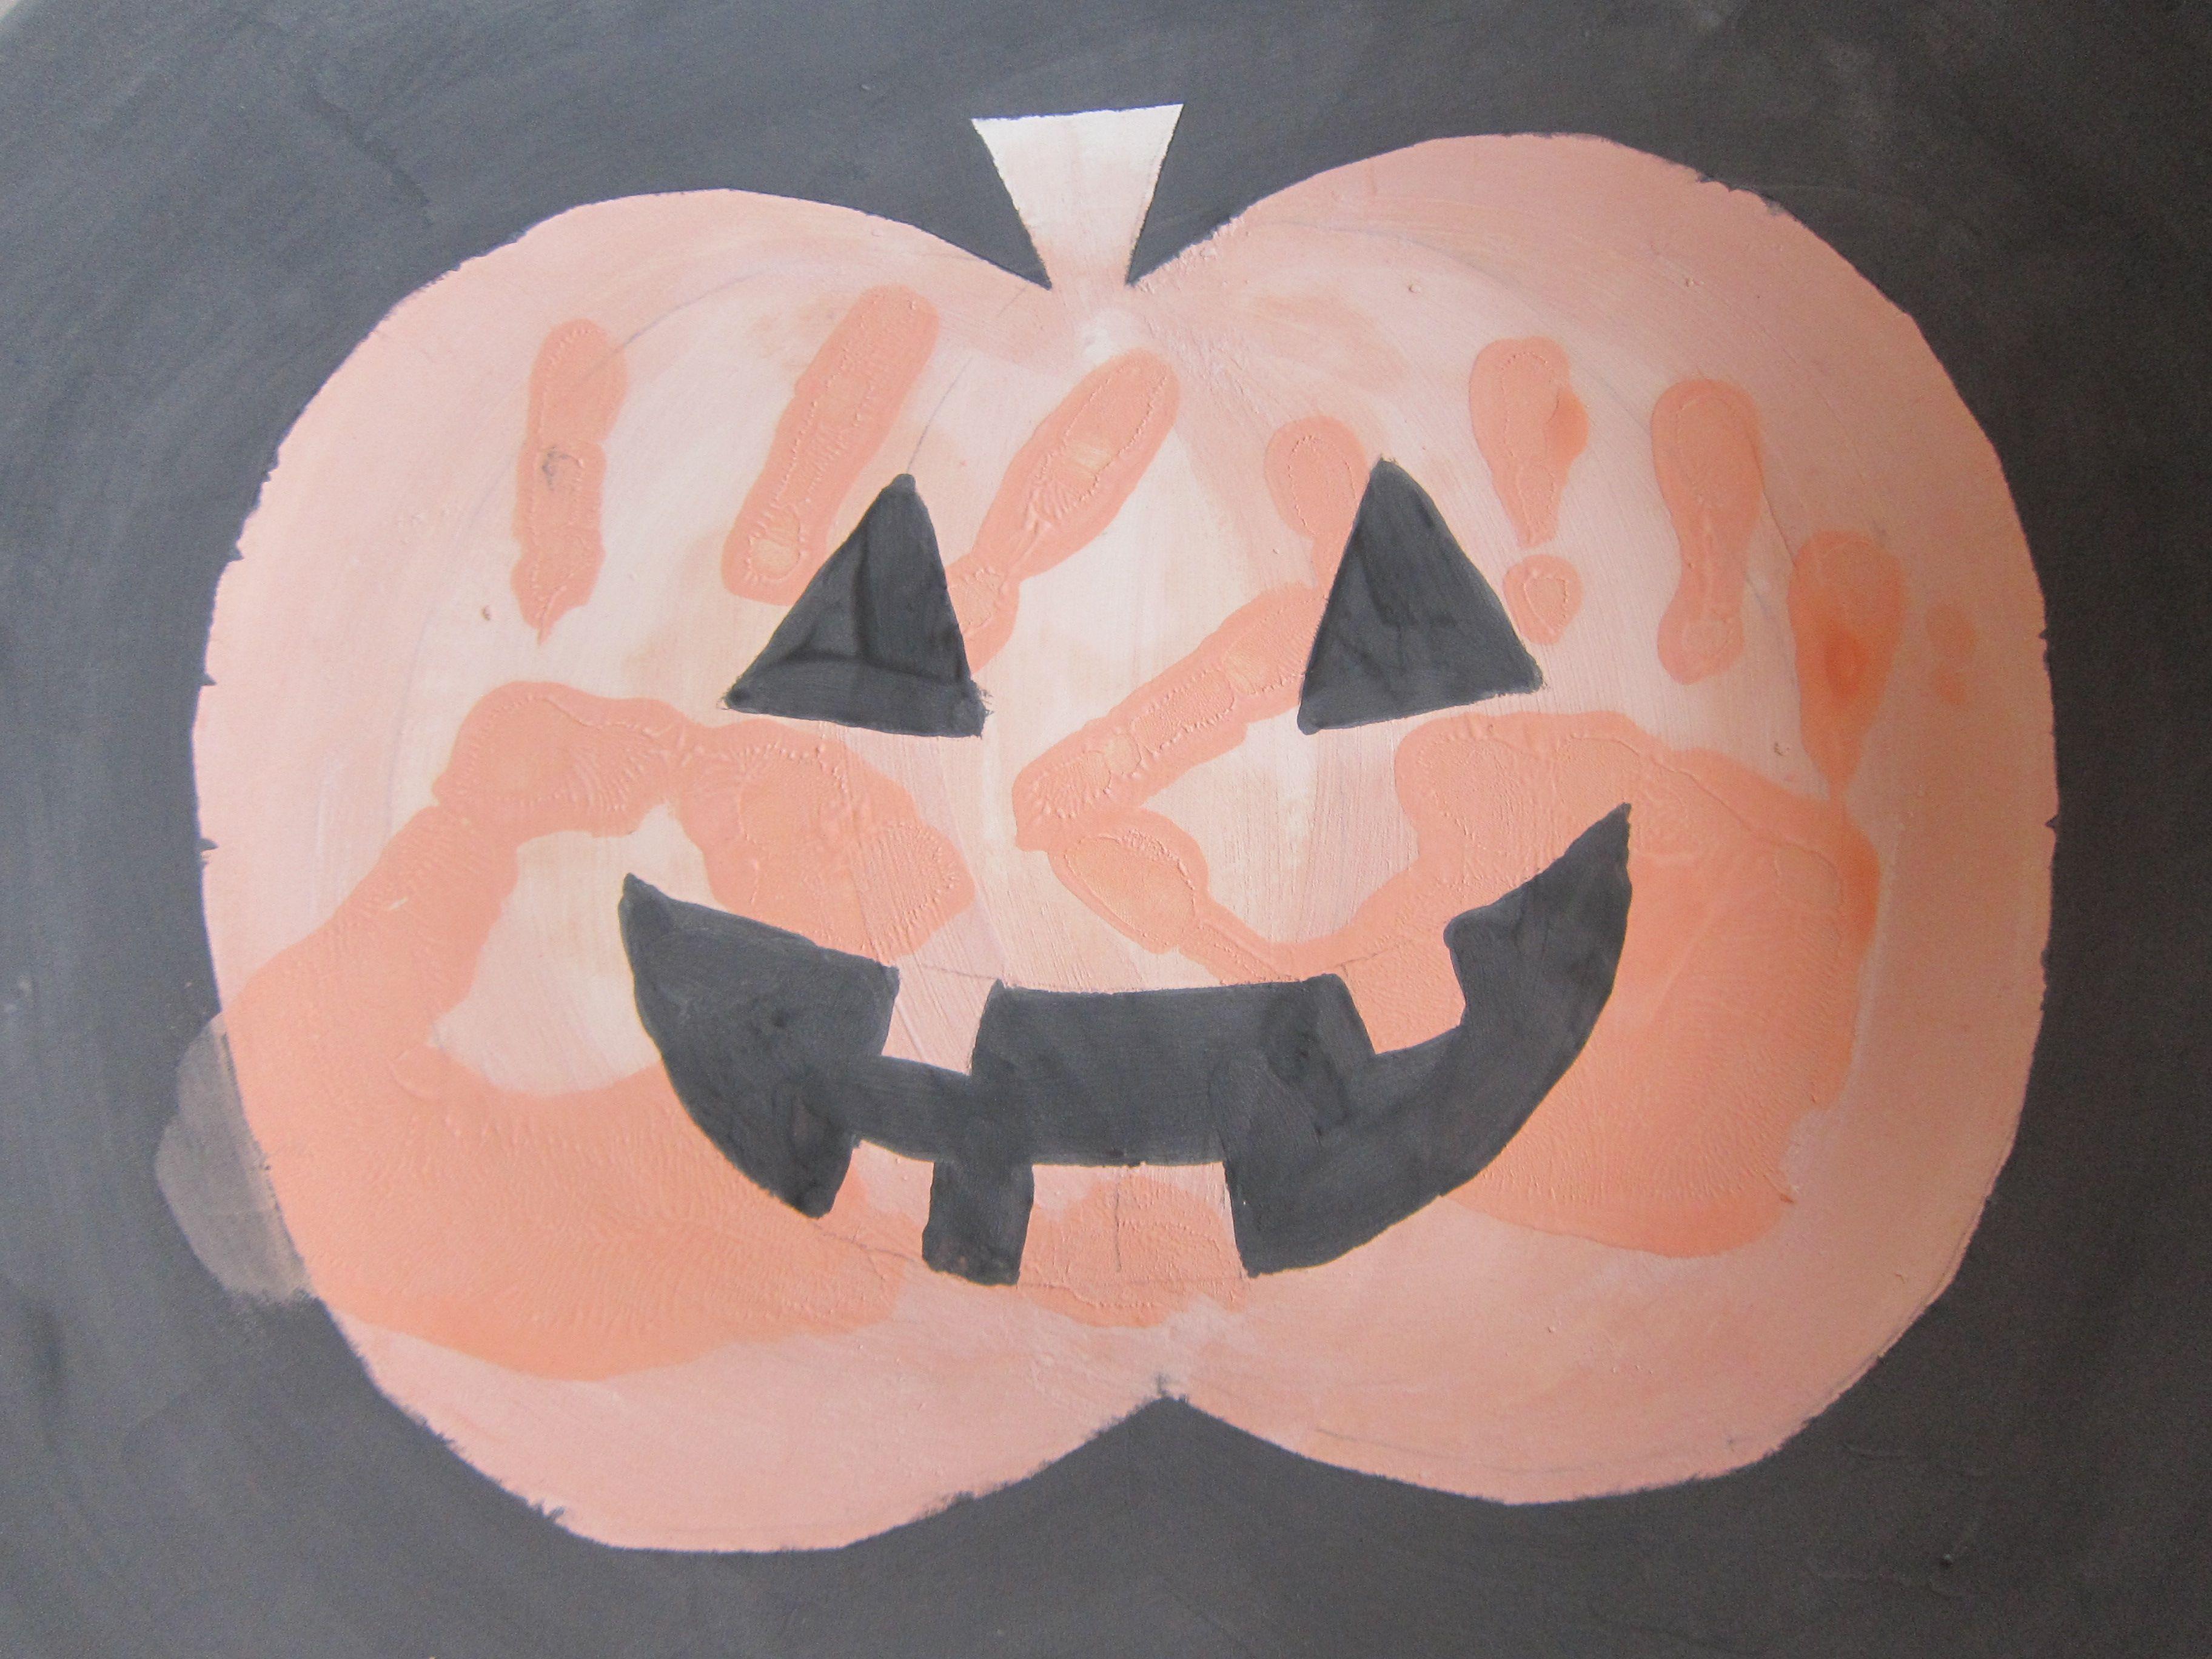 HalloweenCandyBowl09